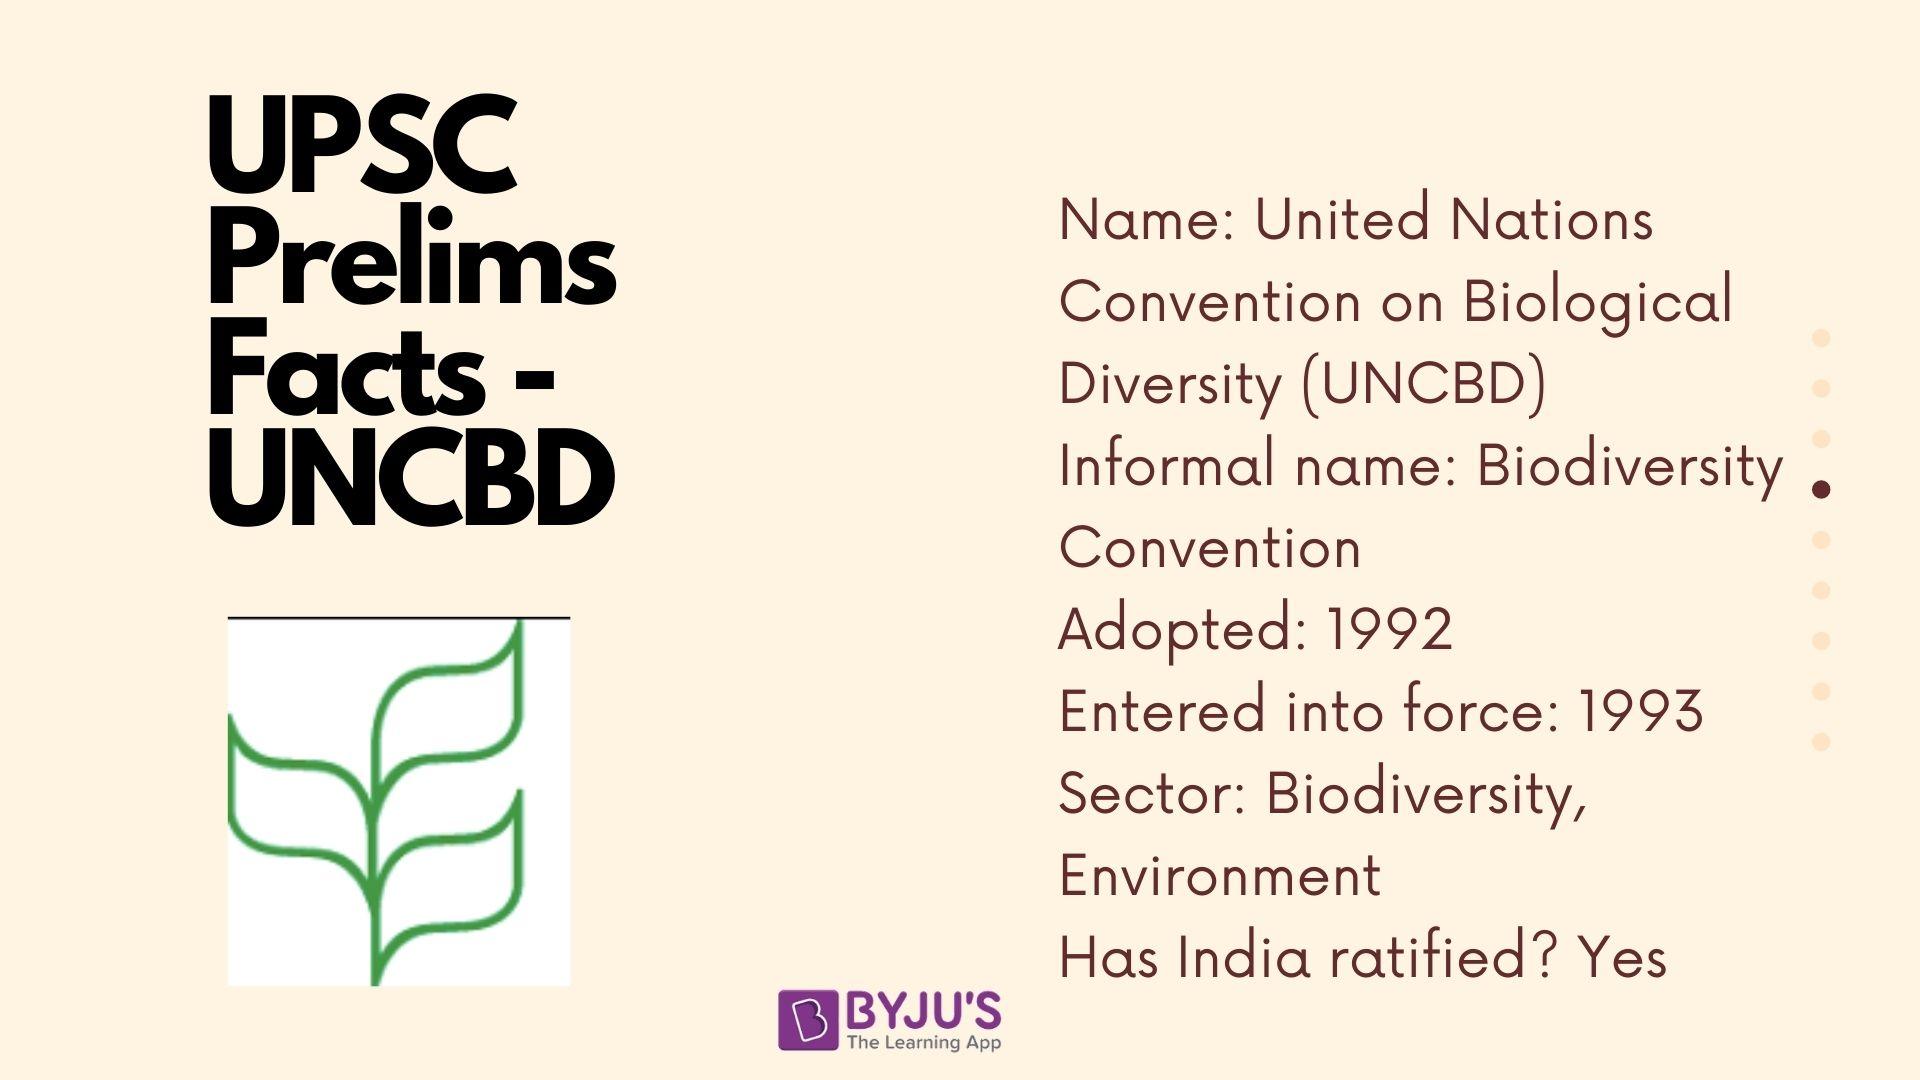 UNCBD Facts